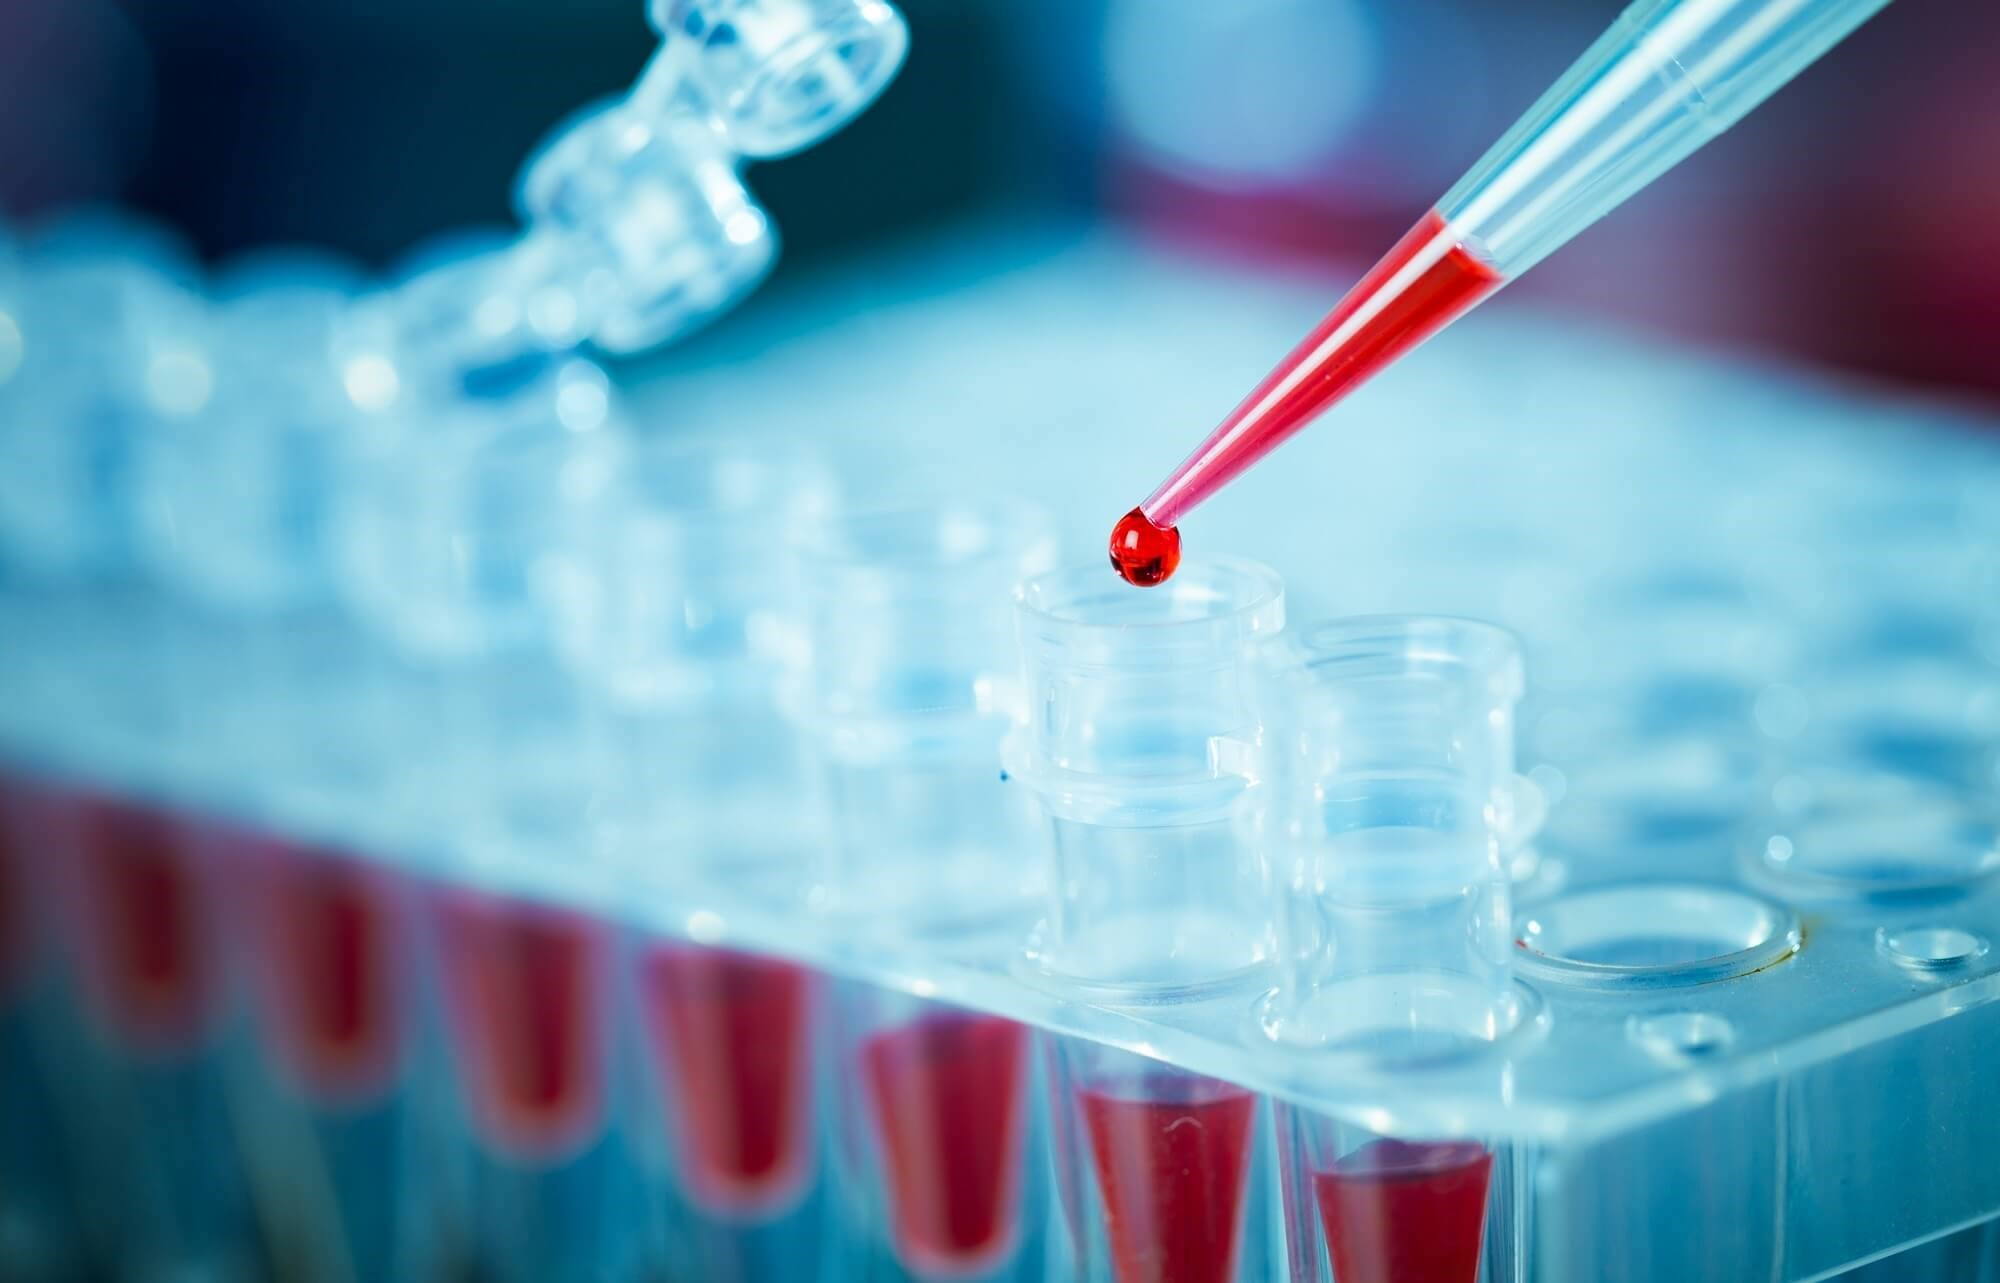 Assessing Measurable Residual Disease in Patients With Acute Lymphoblastic Leukemia